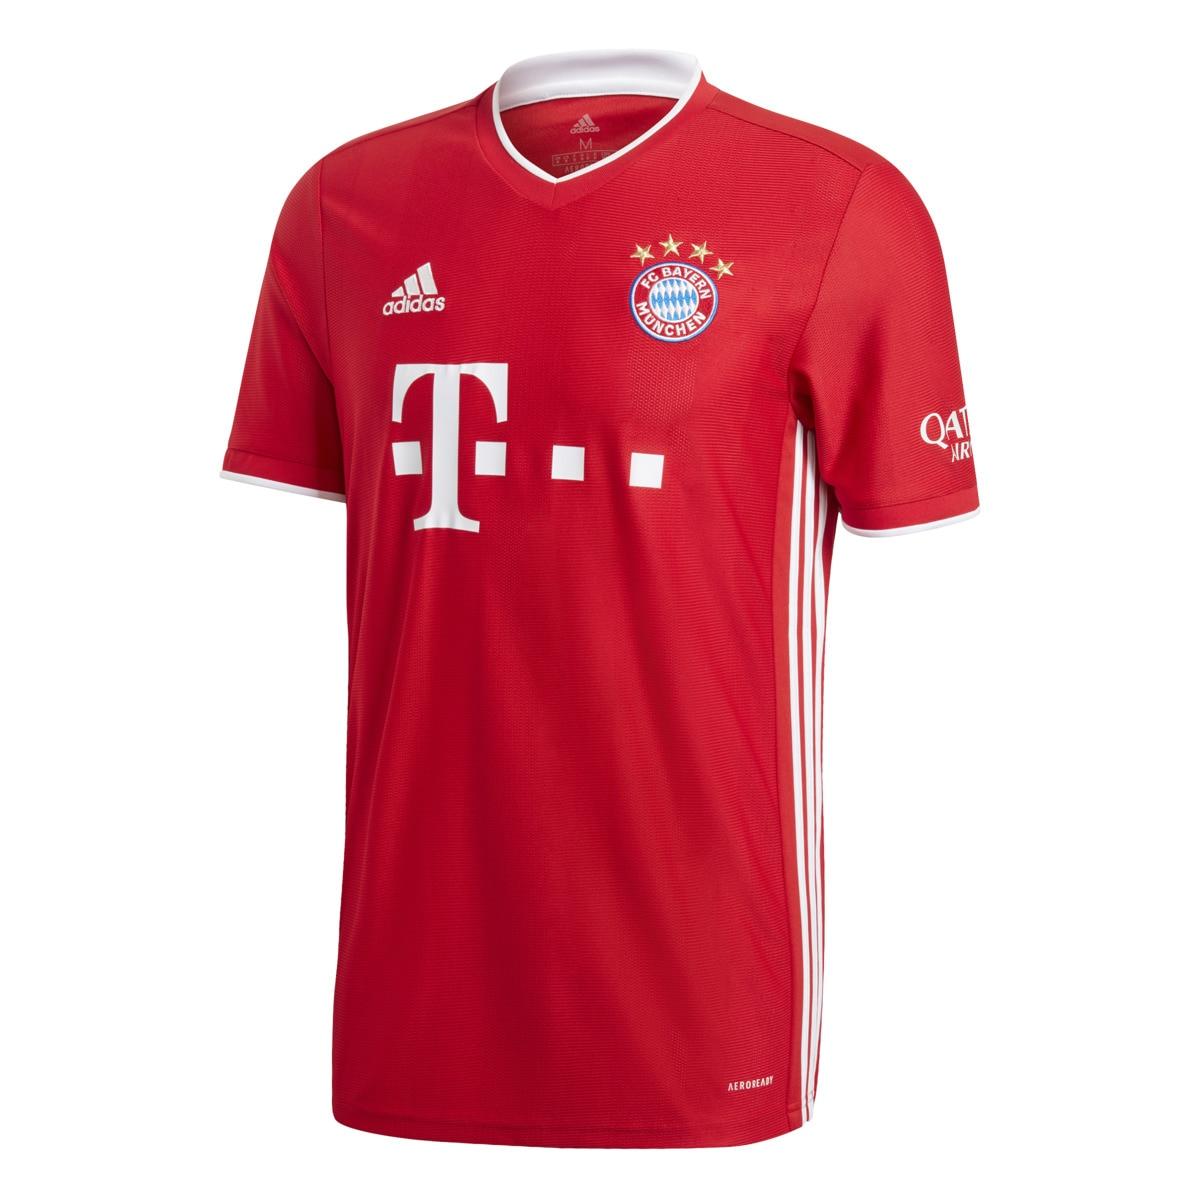 Maillot homme domicile FC Bayern Munich 2020-2021 adidas